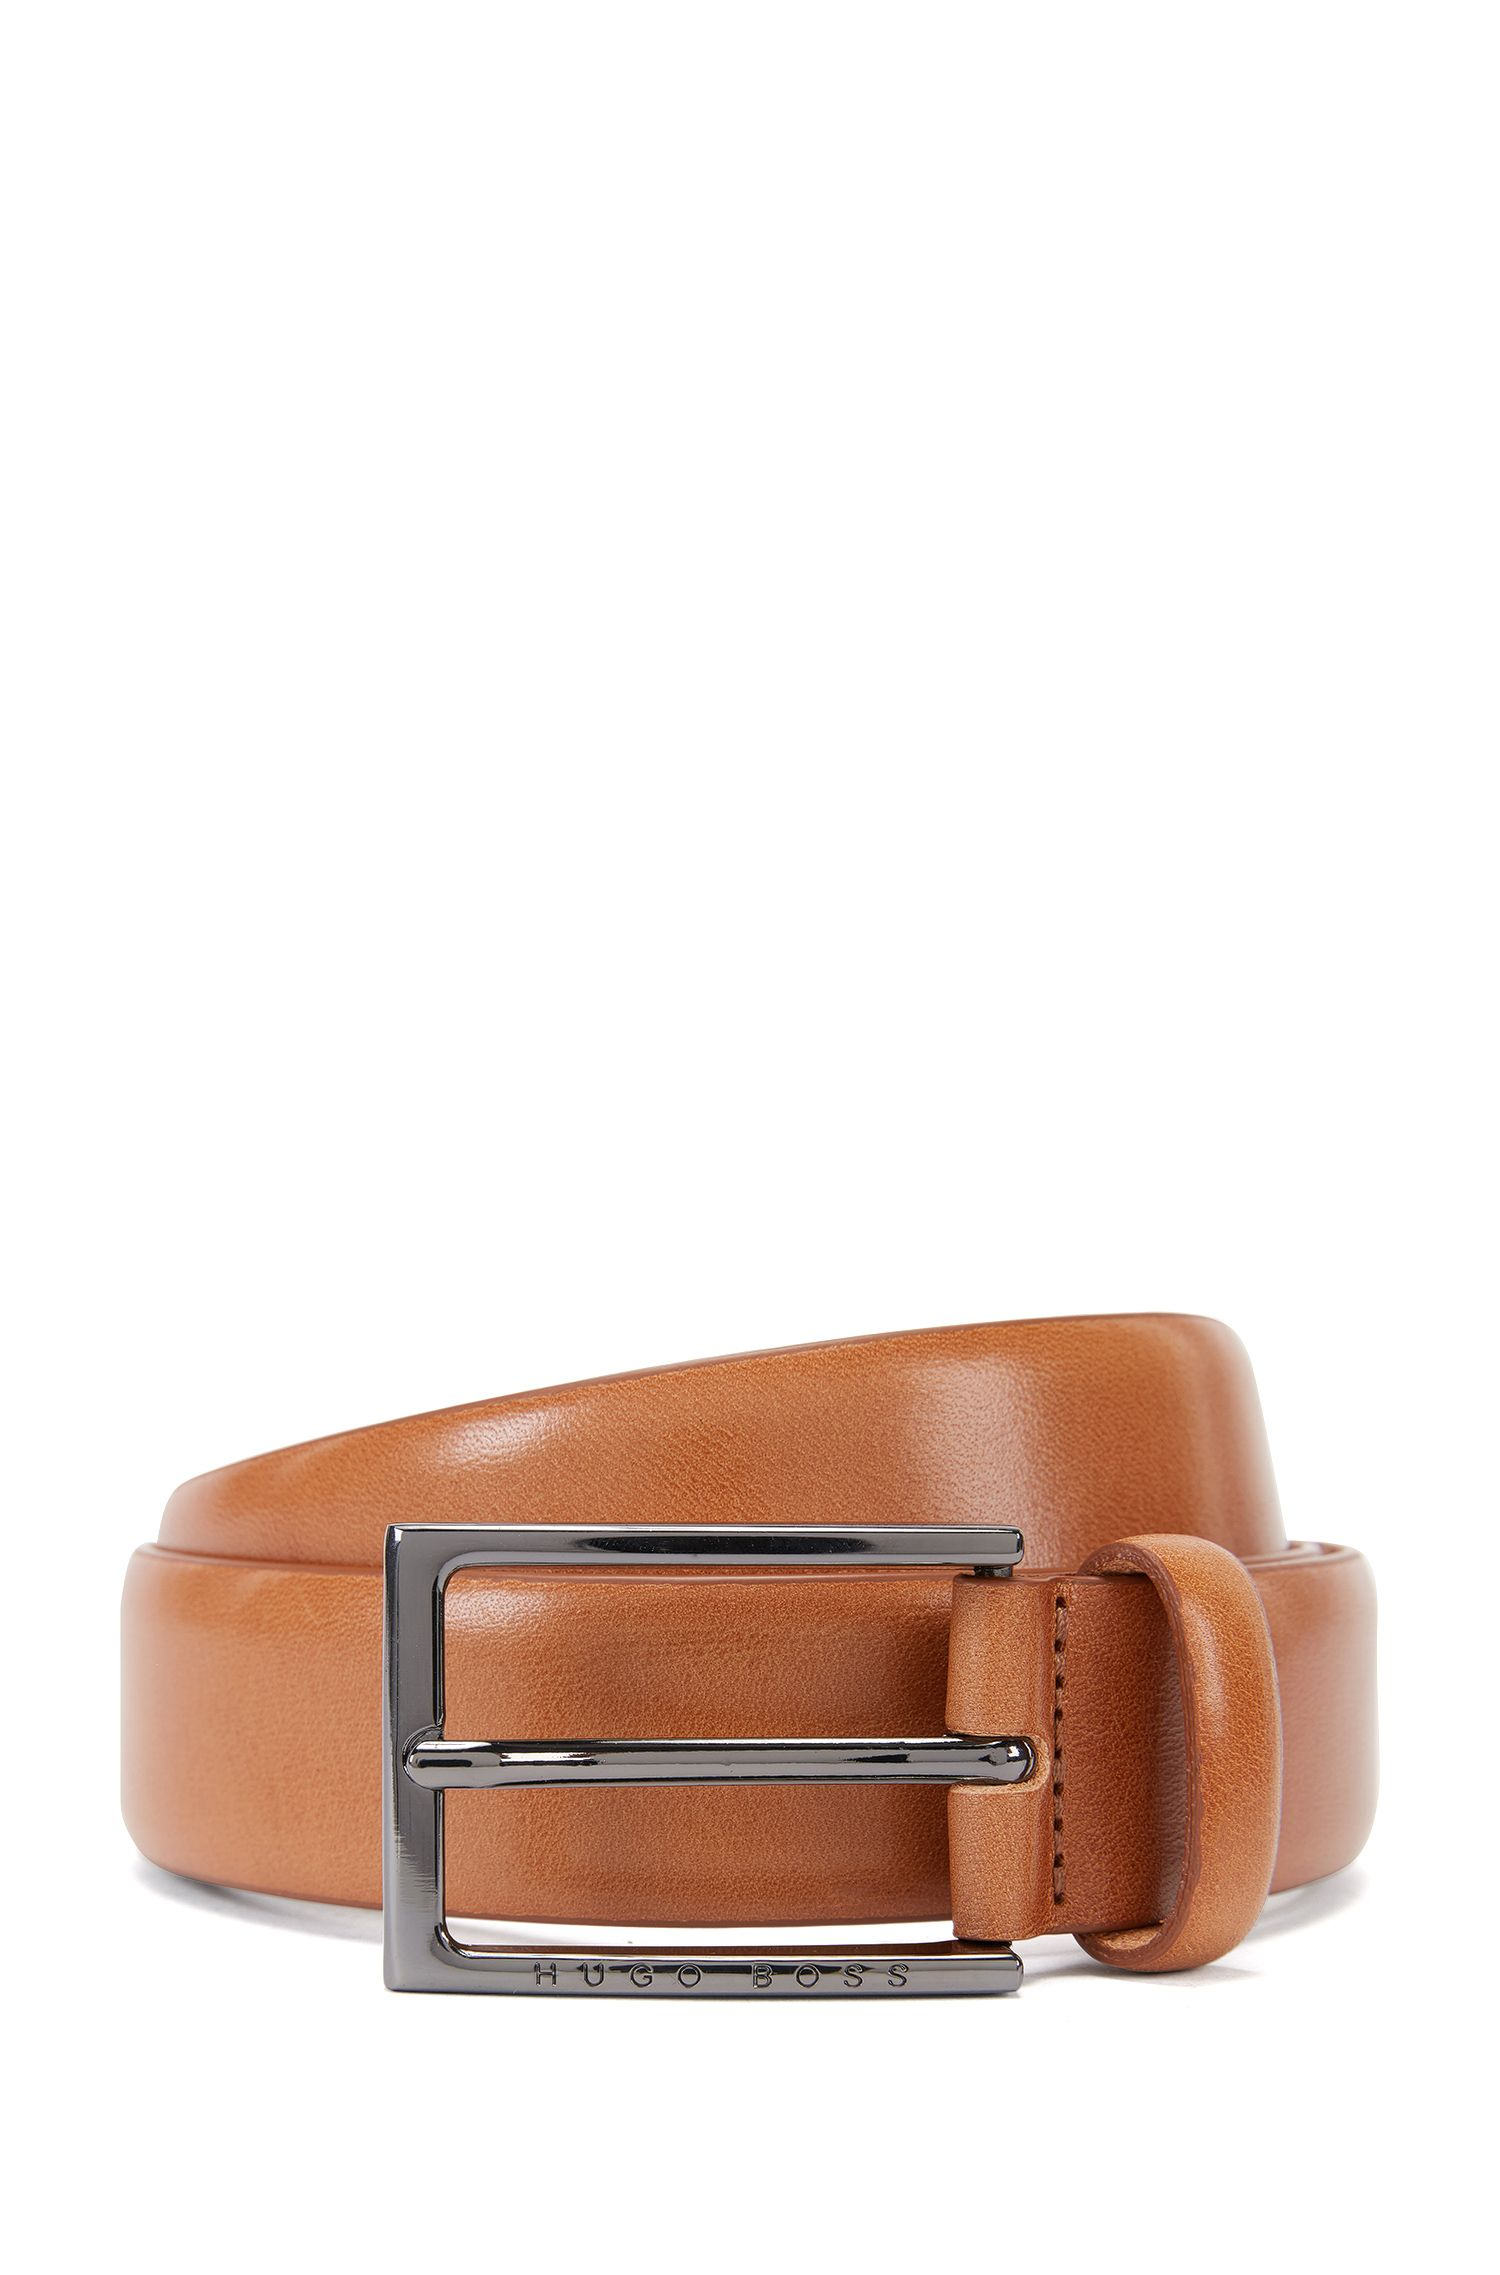 Vegetable-tanned leather belt